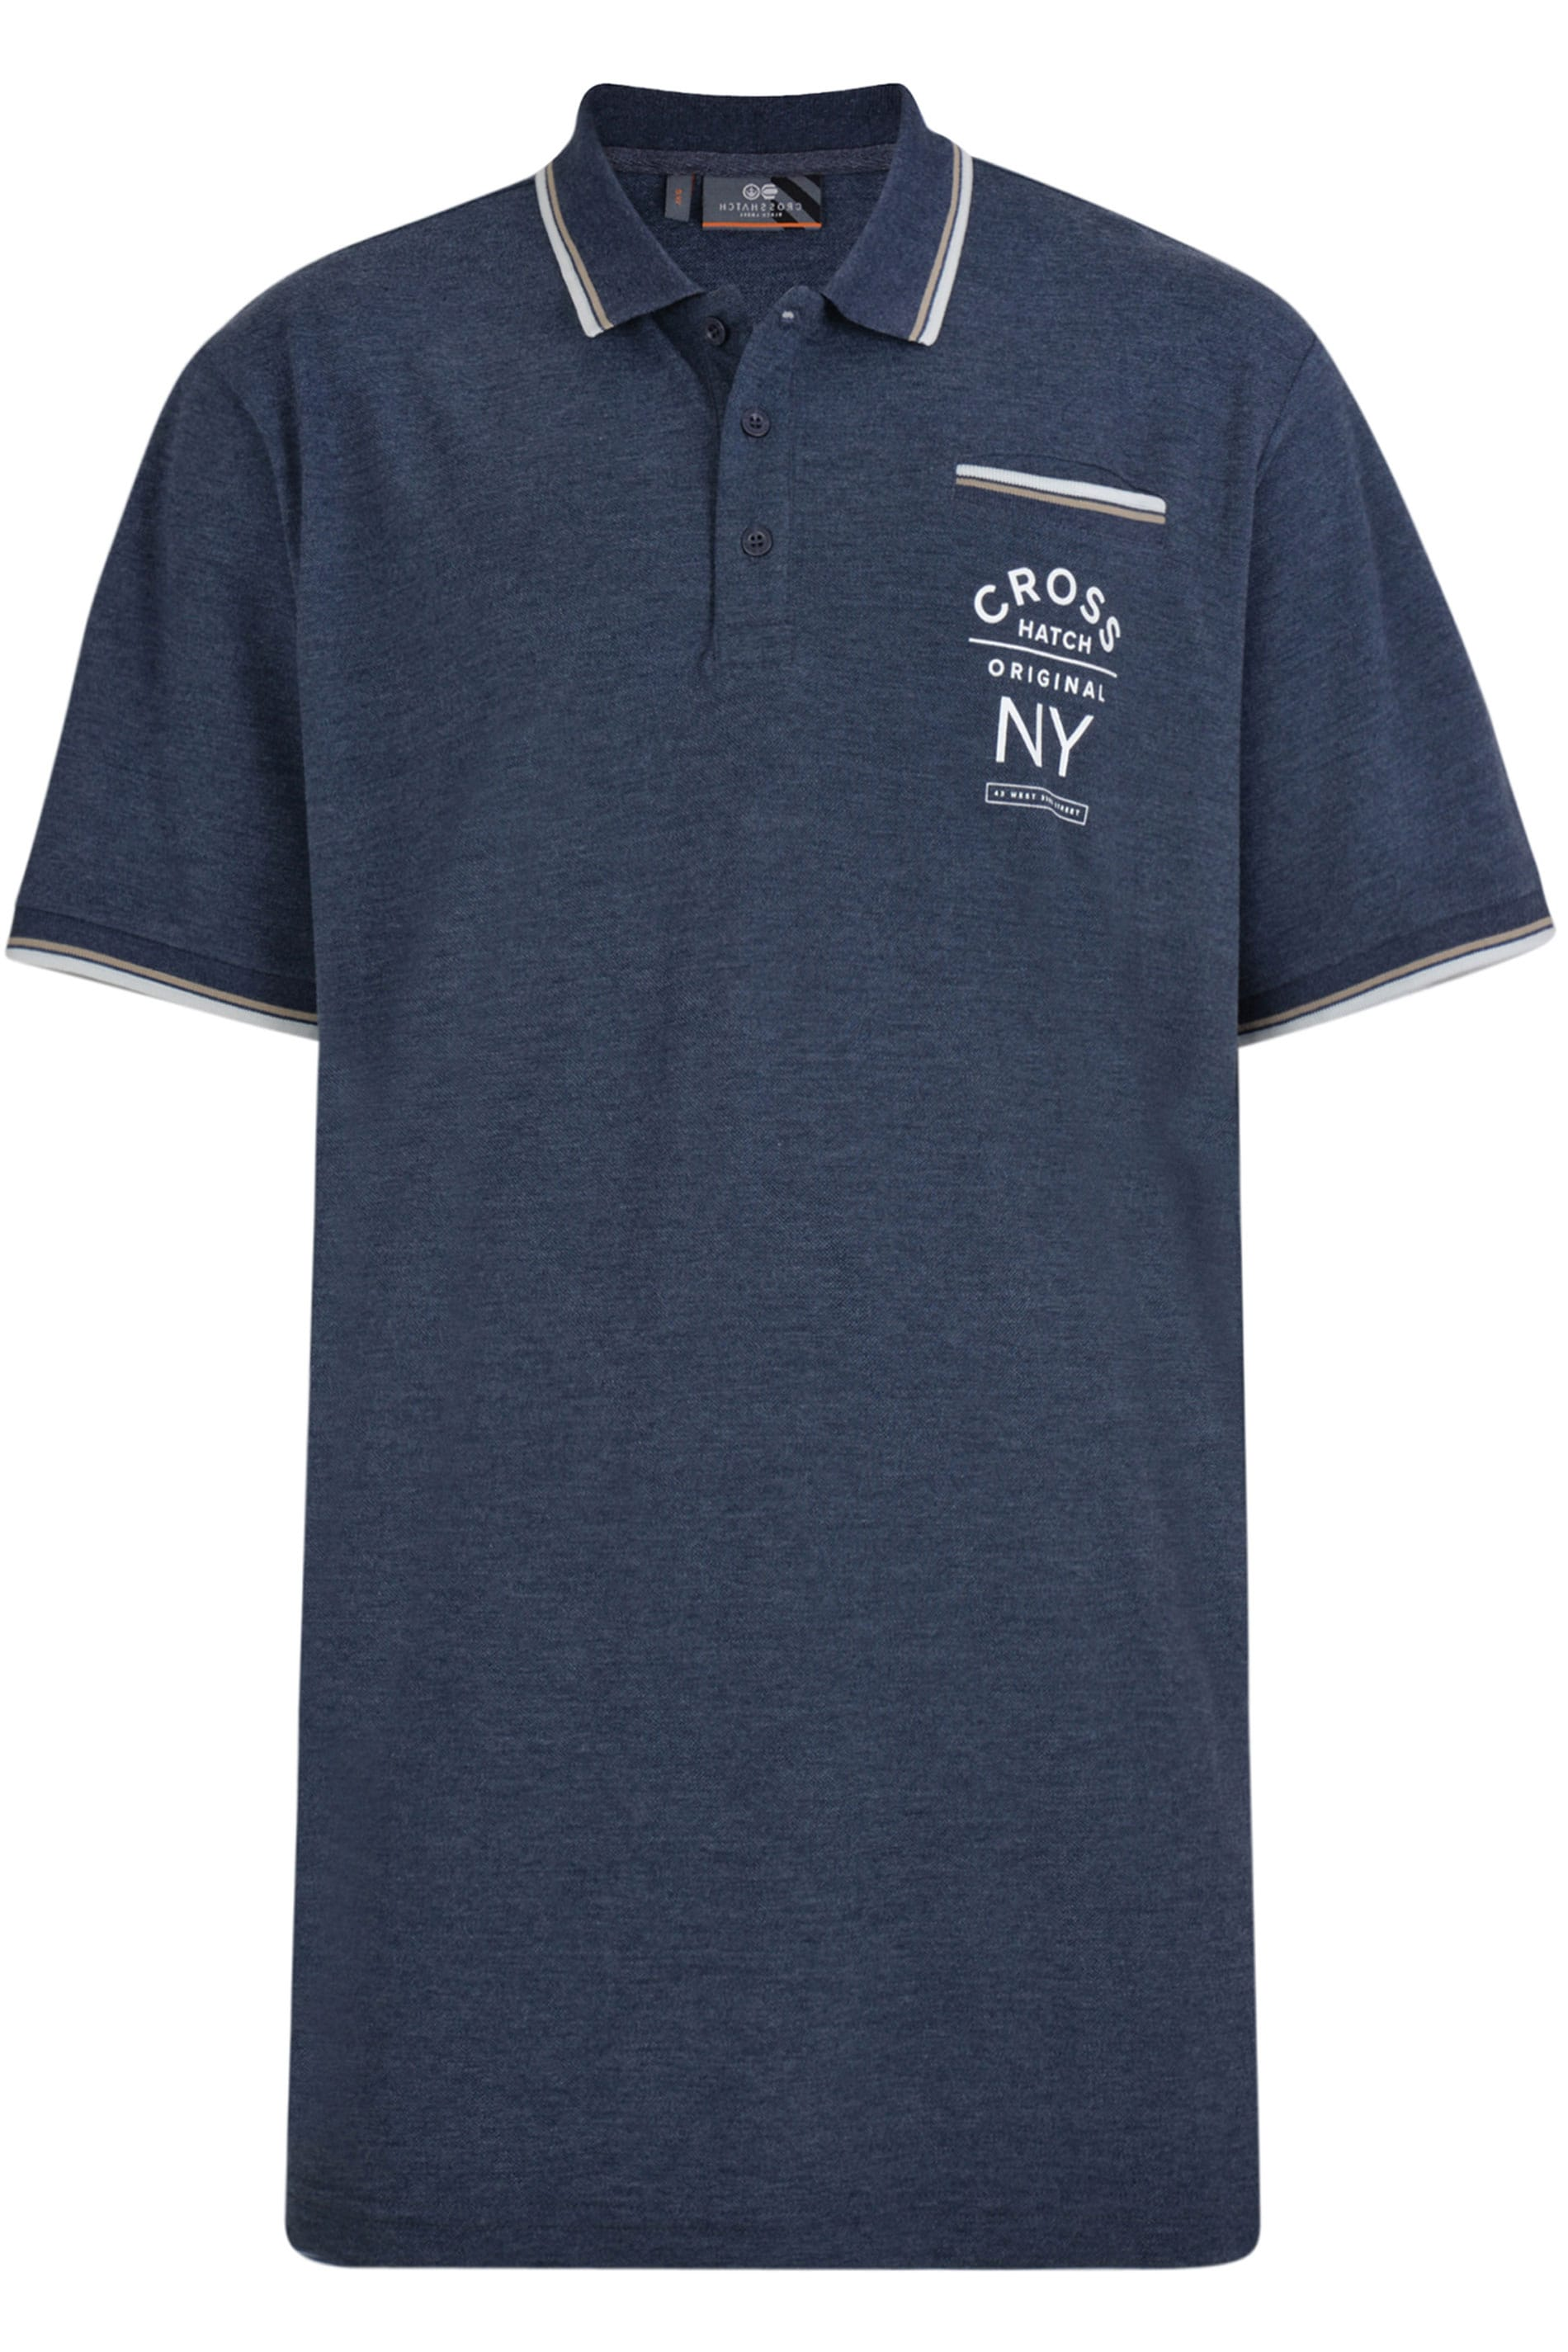 CROSSHATCH Navy Pique Polo Shirt